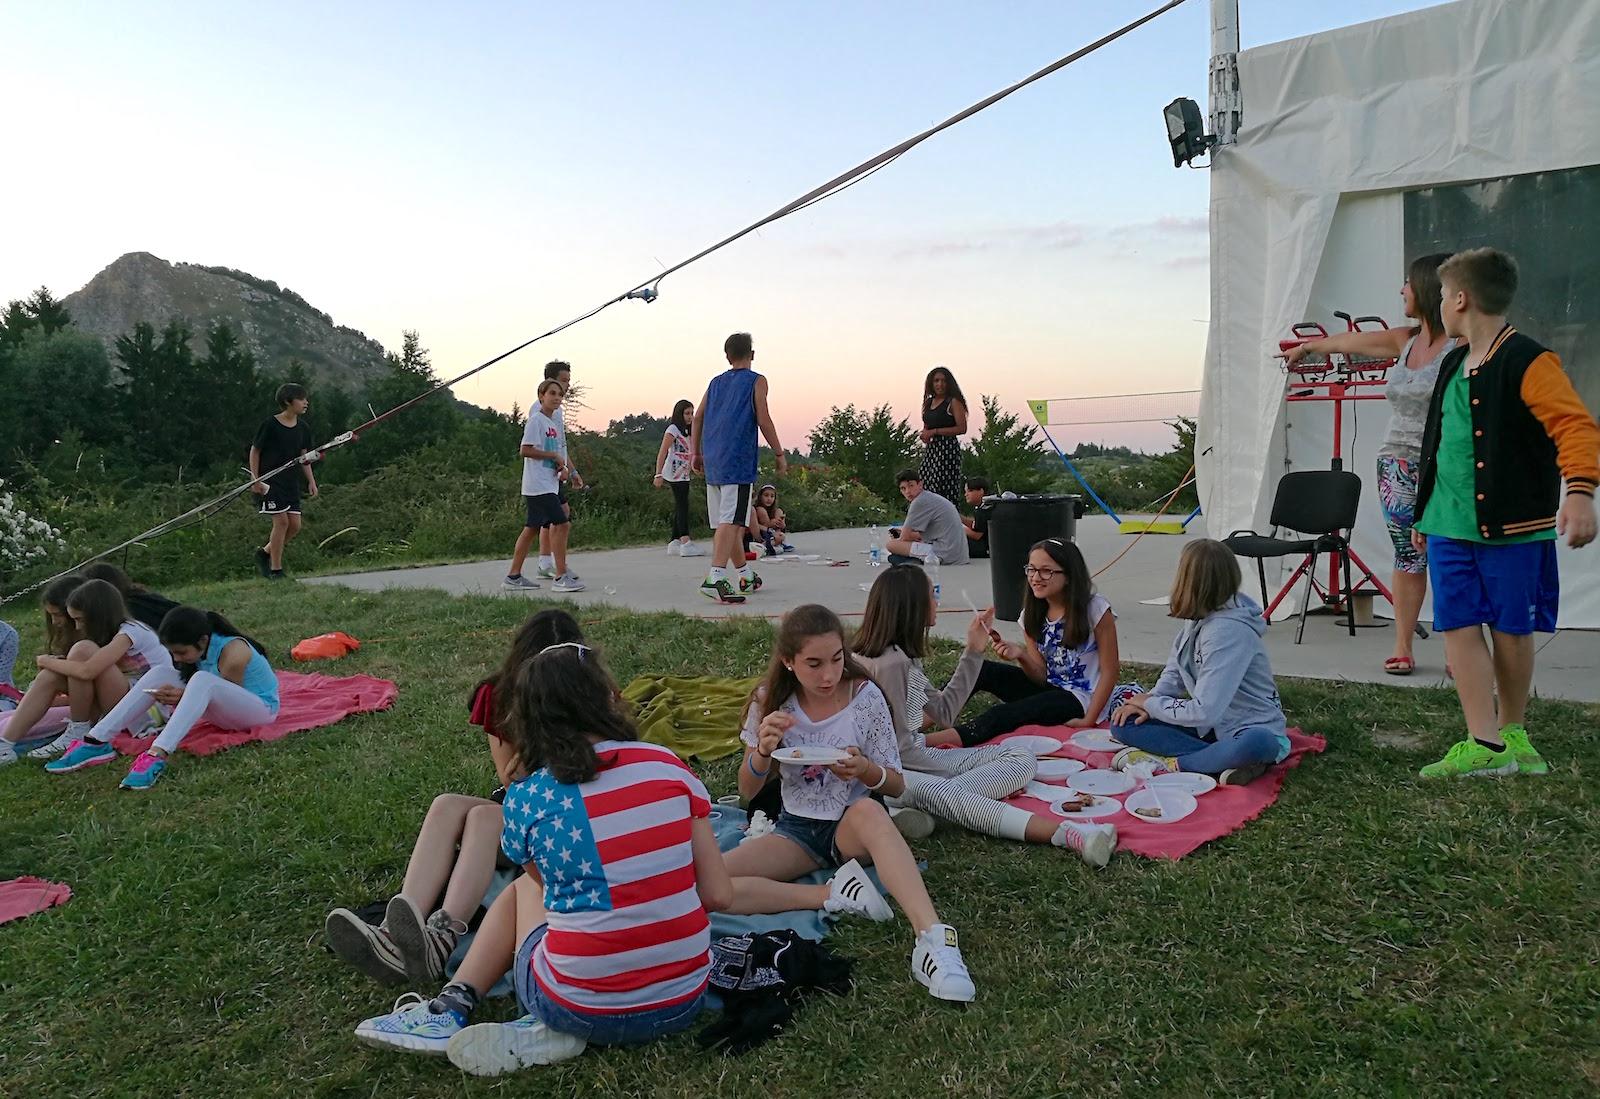 Campus estivi 2019: alcune ottime proposte! - Familygo